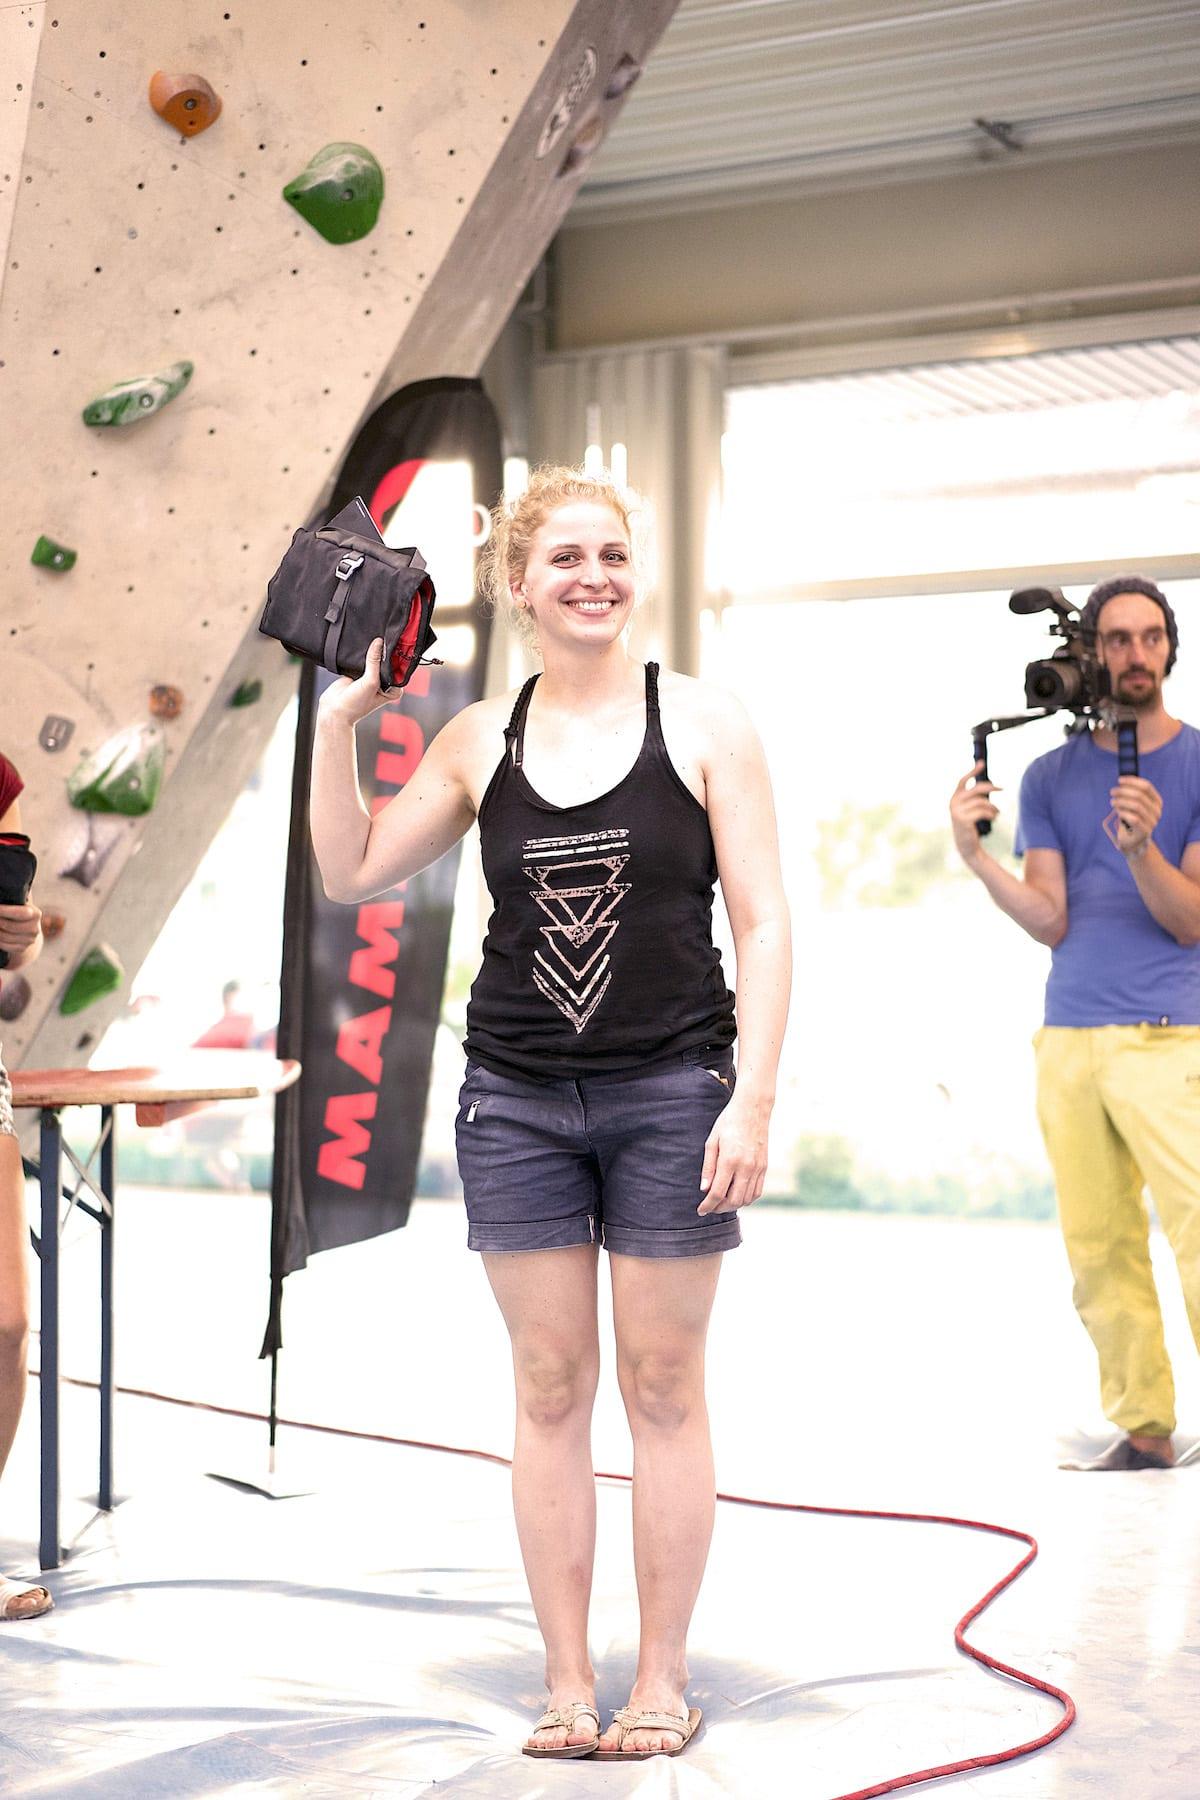 internationaler bouldercup Frankenjura 2016, BLOCKHELDEN Erlangen, Mammut, Bergfreunde.de, Boulderwettkampf07092016876